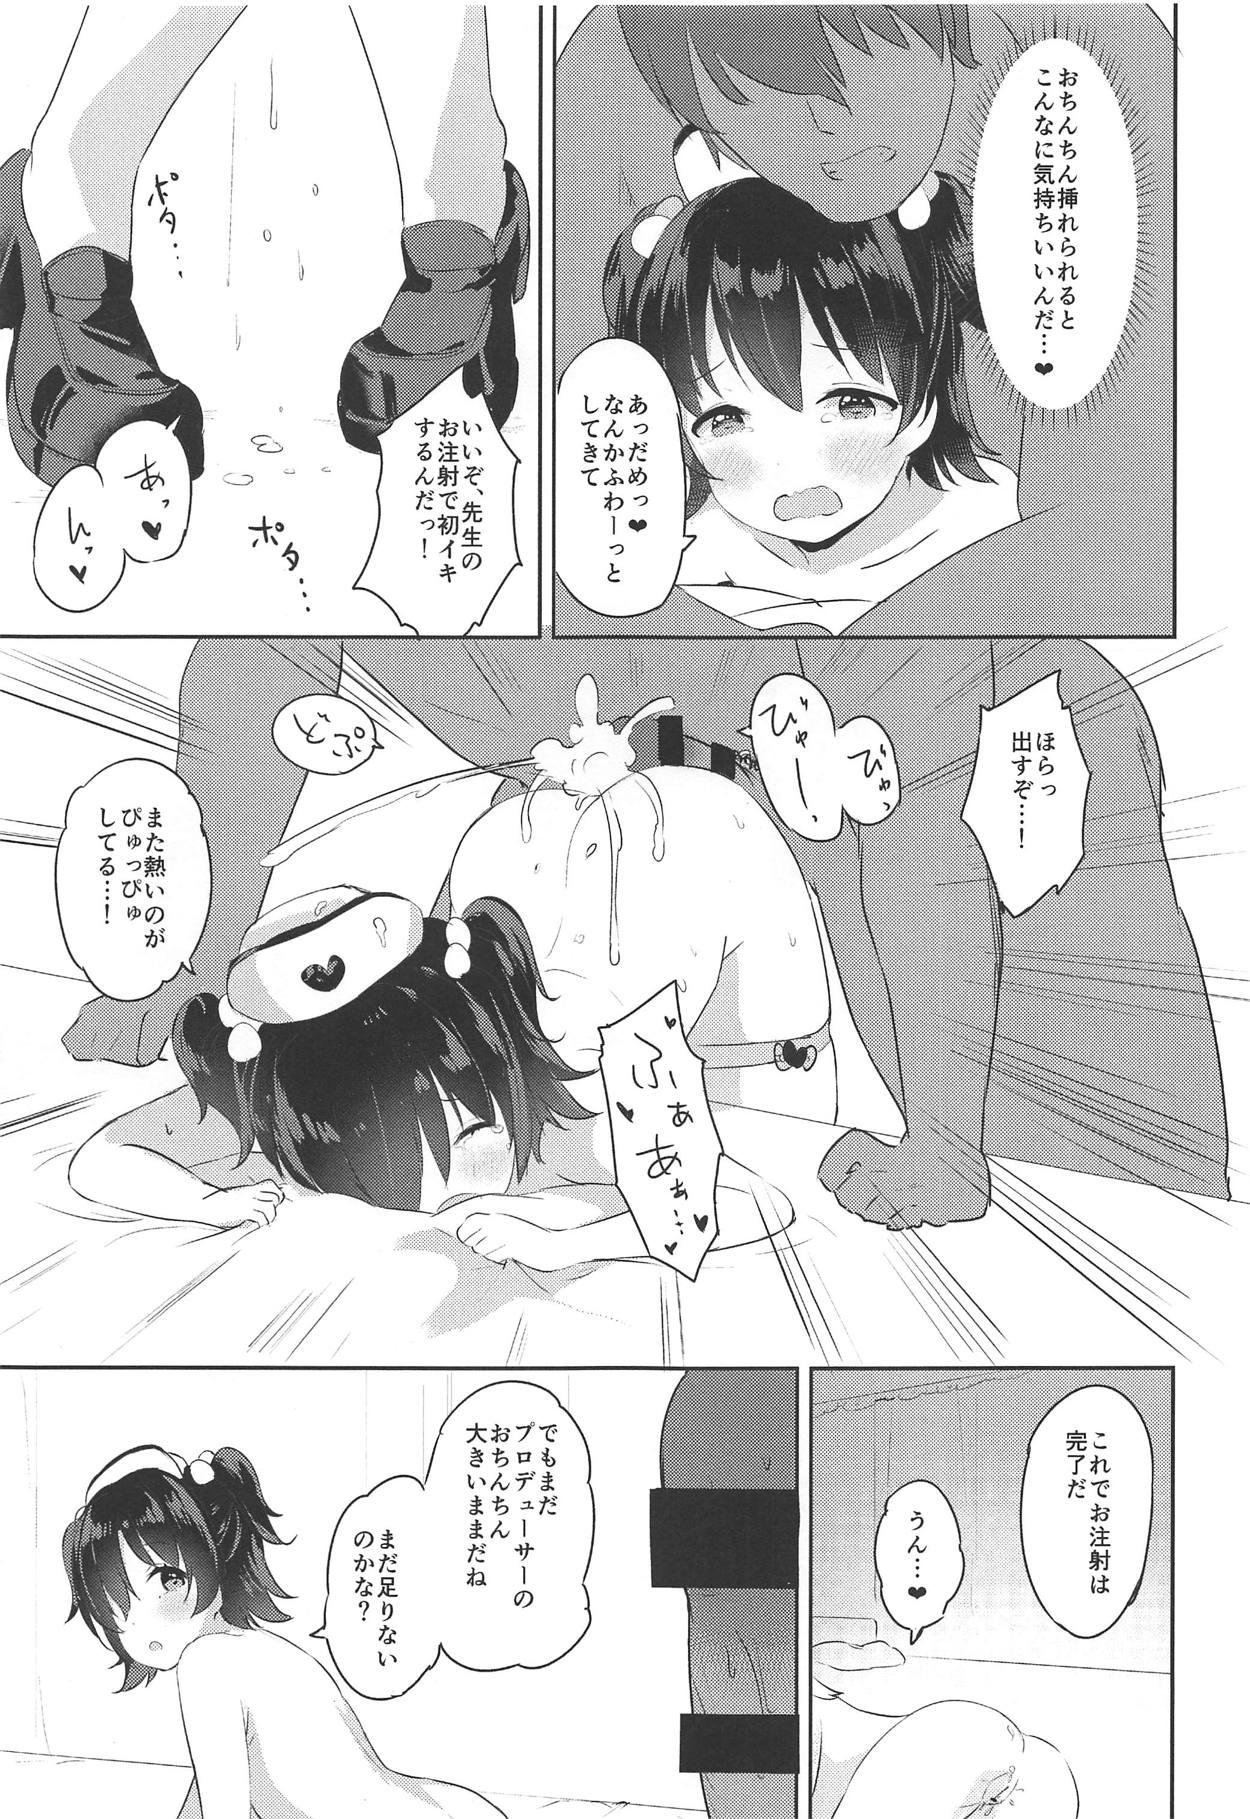 Miria-chan no Lolita Byoutou 13